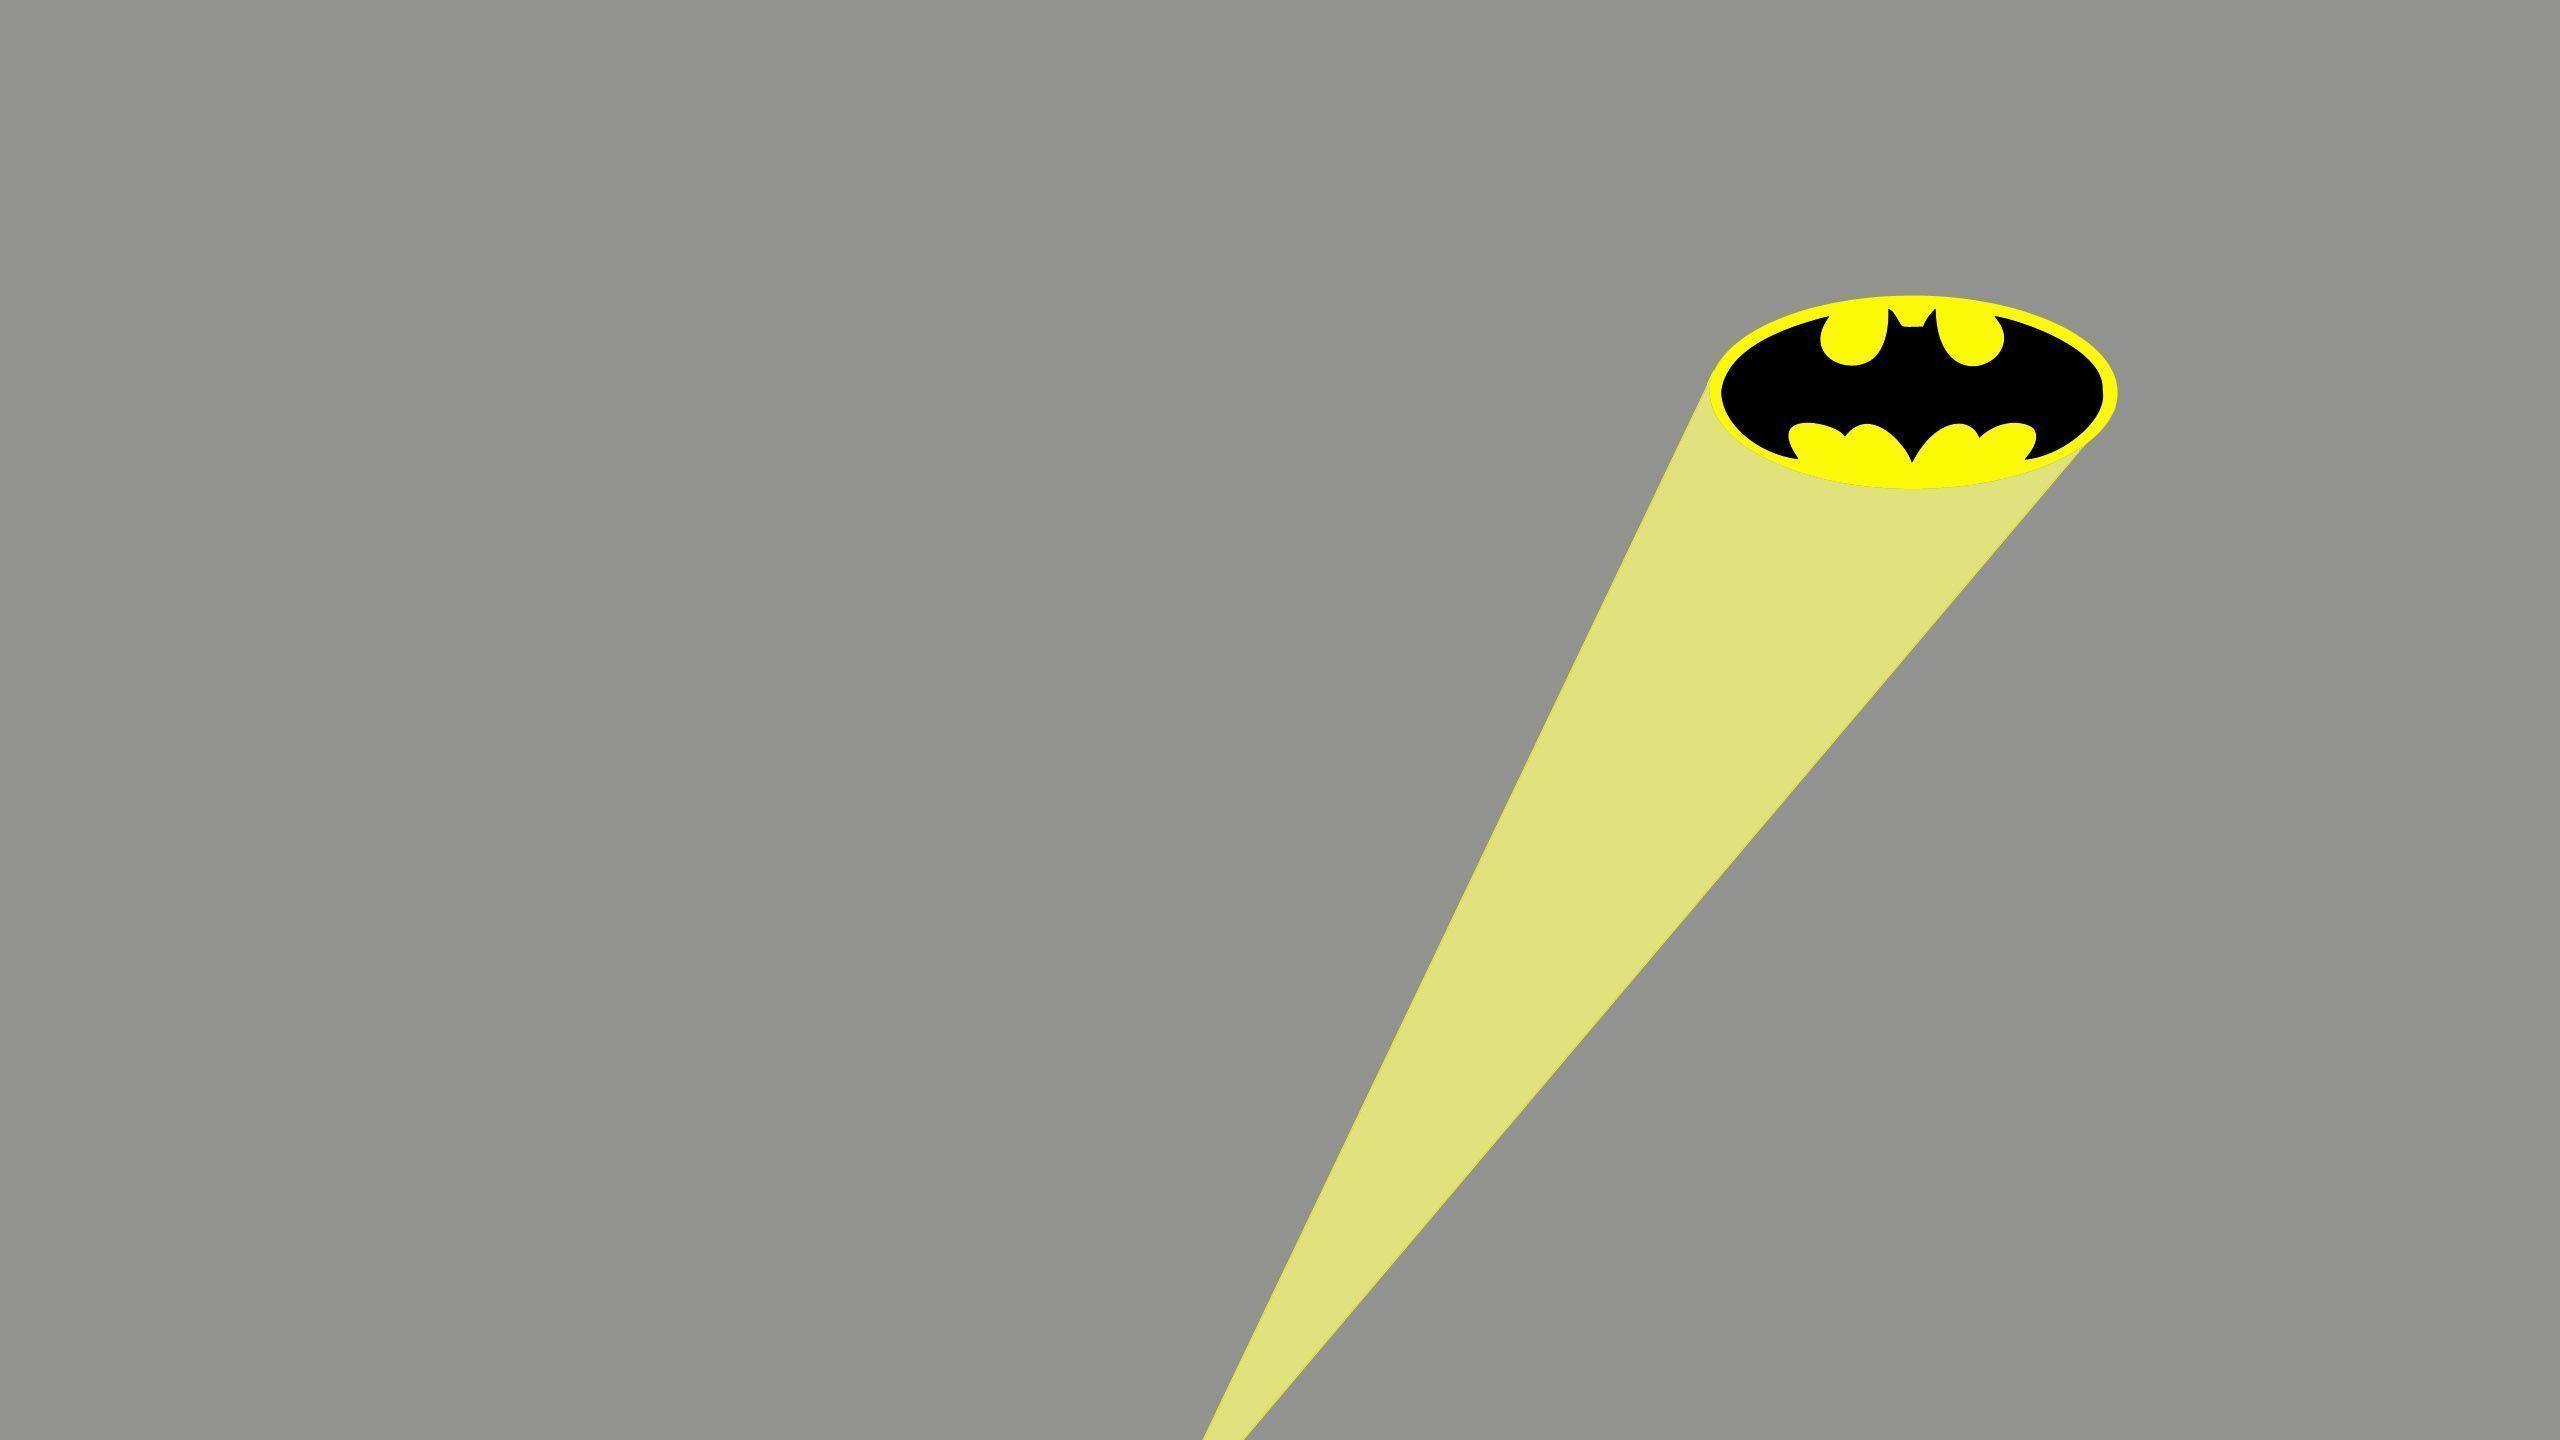 Bat Signal Wallpapers.